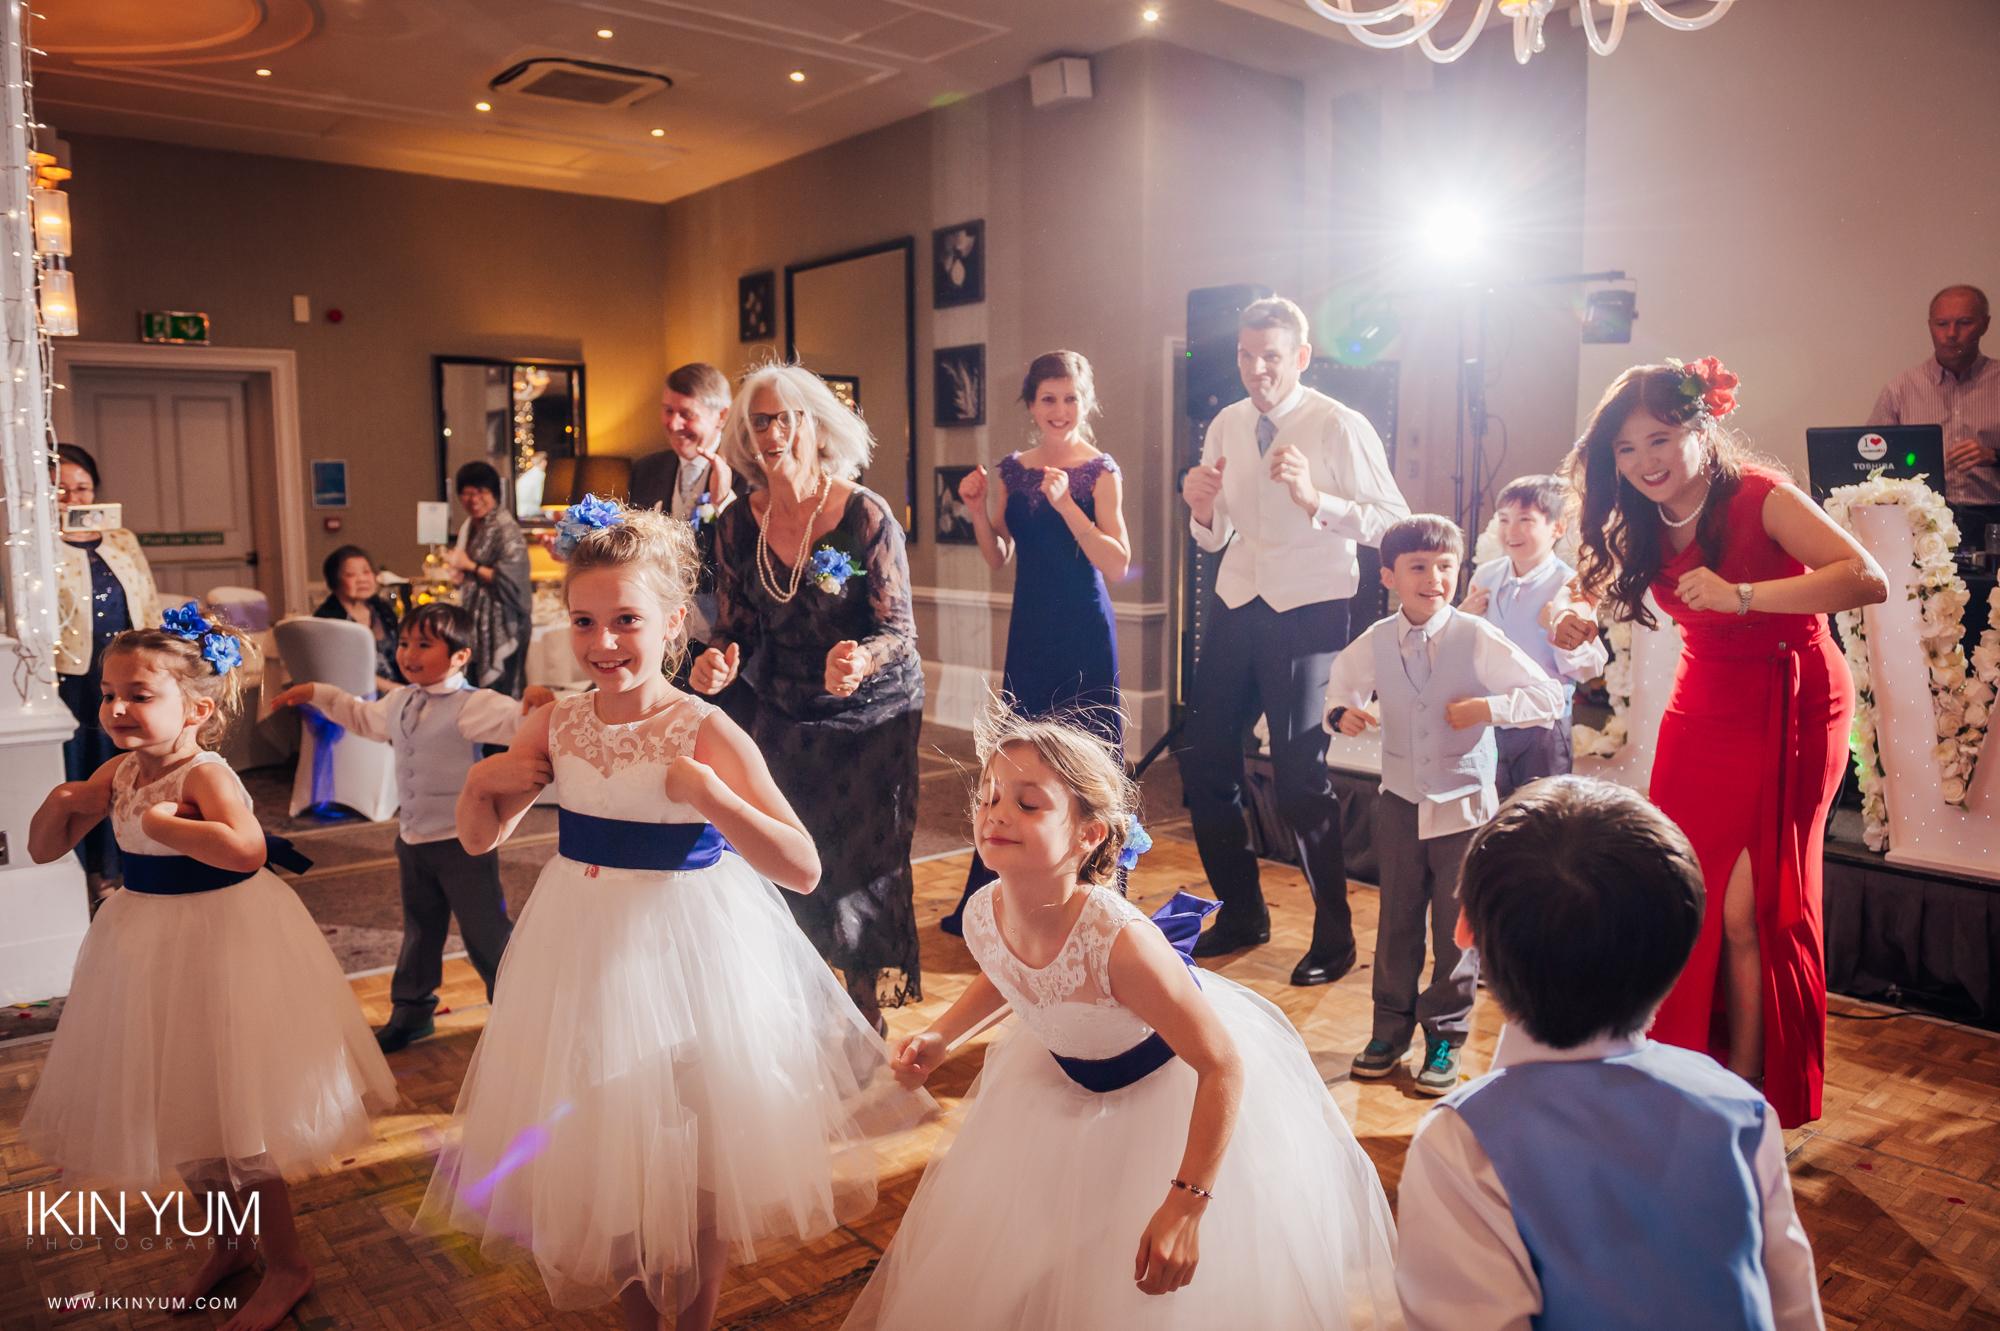 Teresa & Johnathan Weddong Day - First Dance & Party-0081.jpg